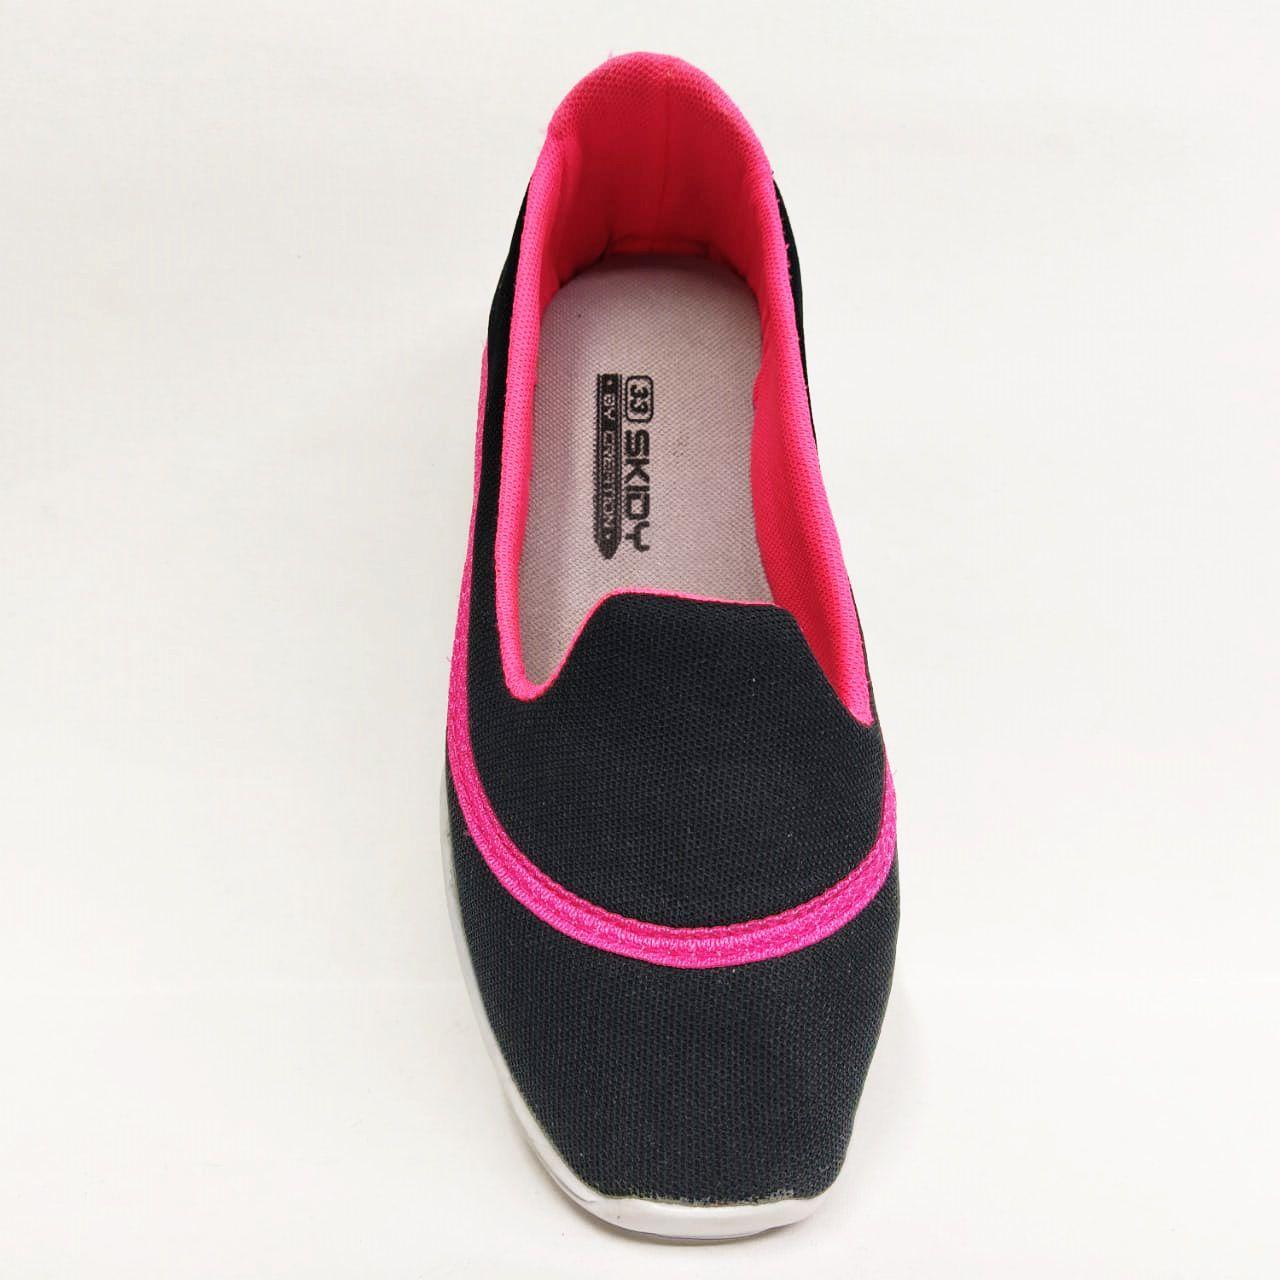 Tênis Infantil Feminino Skidy R23 - Preto / Pink